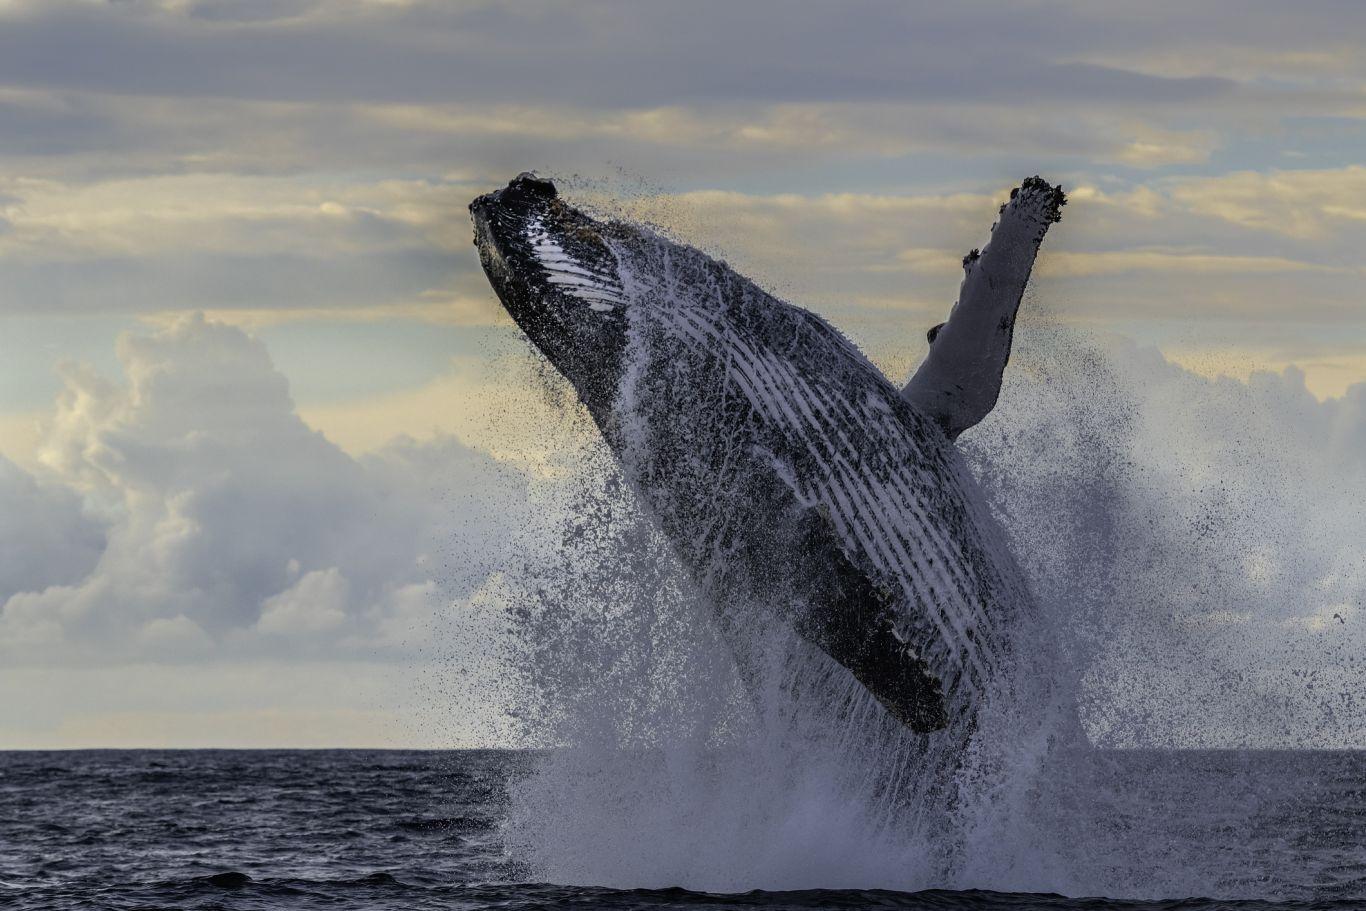 baleias antártica 3